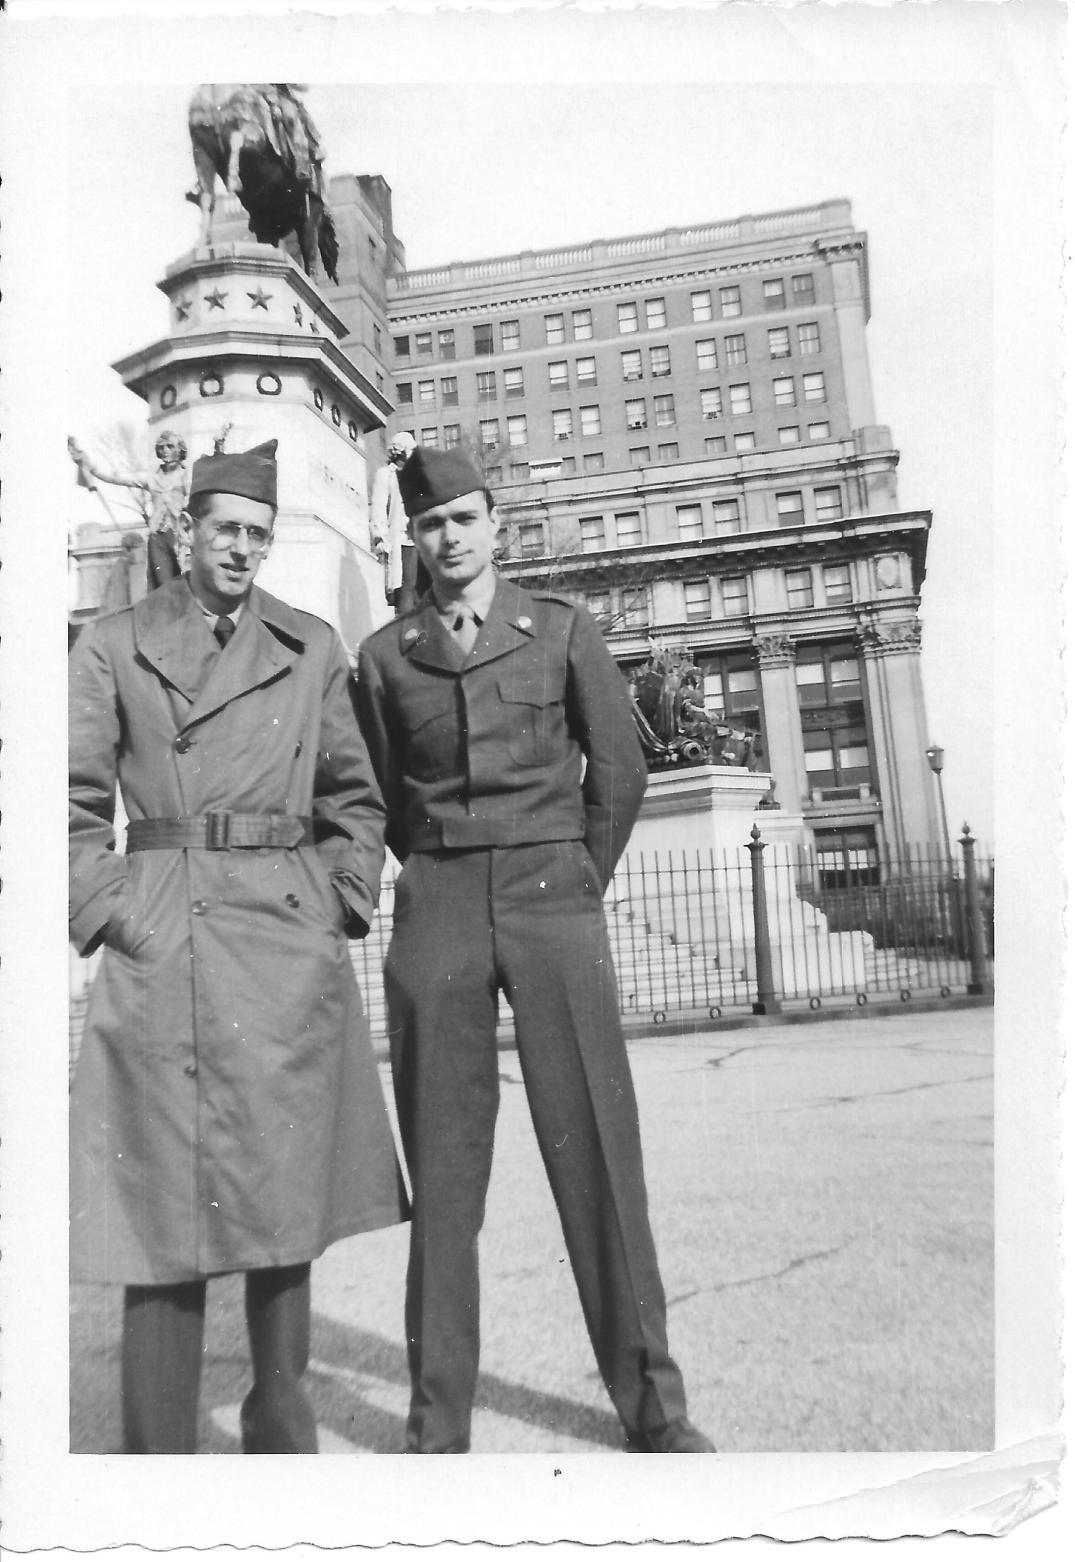 39 MASH Andy Luftig and Don Feeney, Richmond, VA 1952